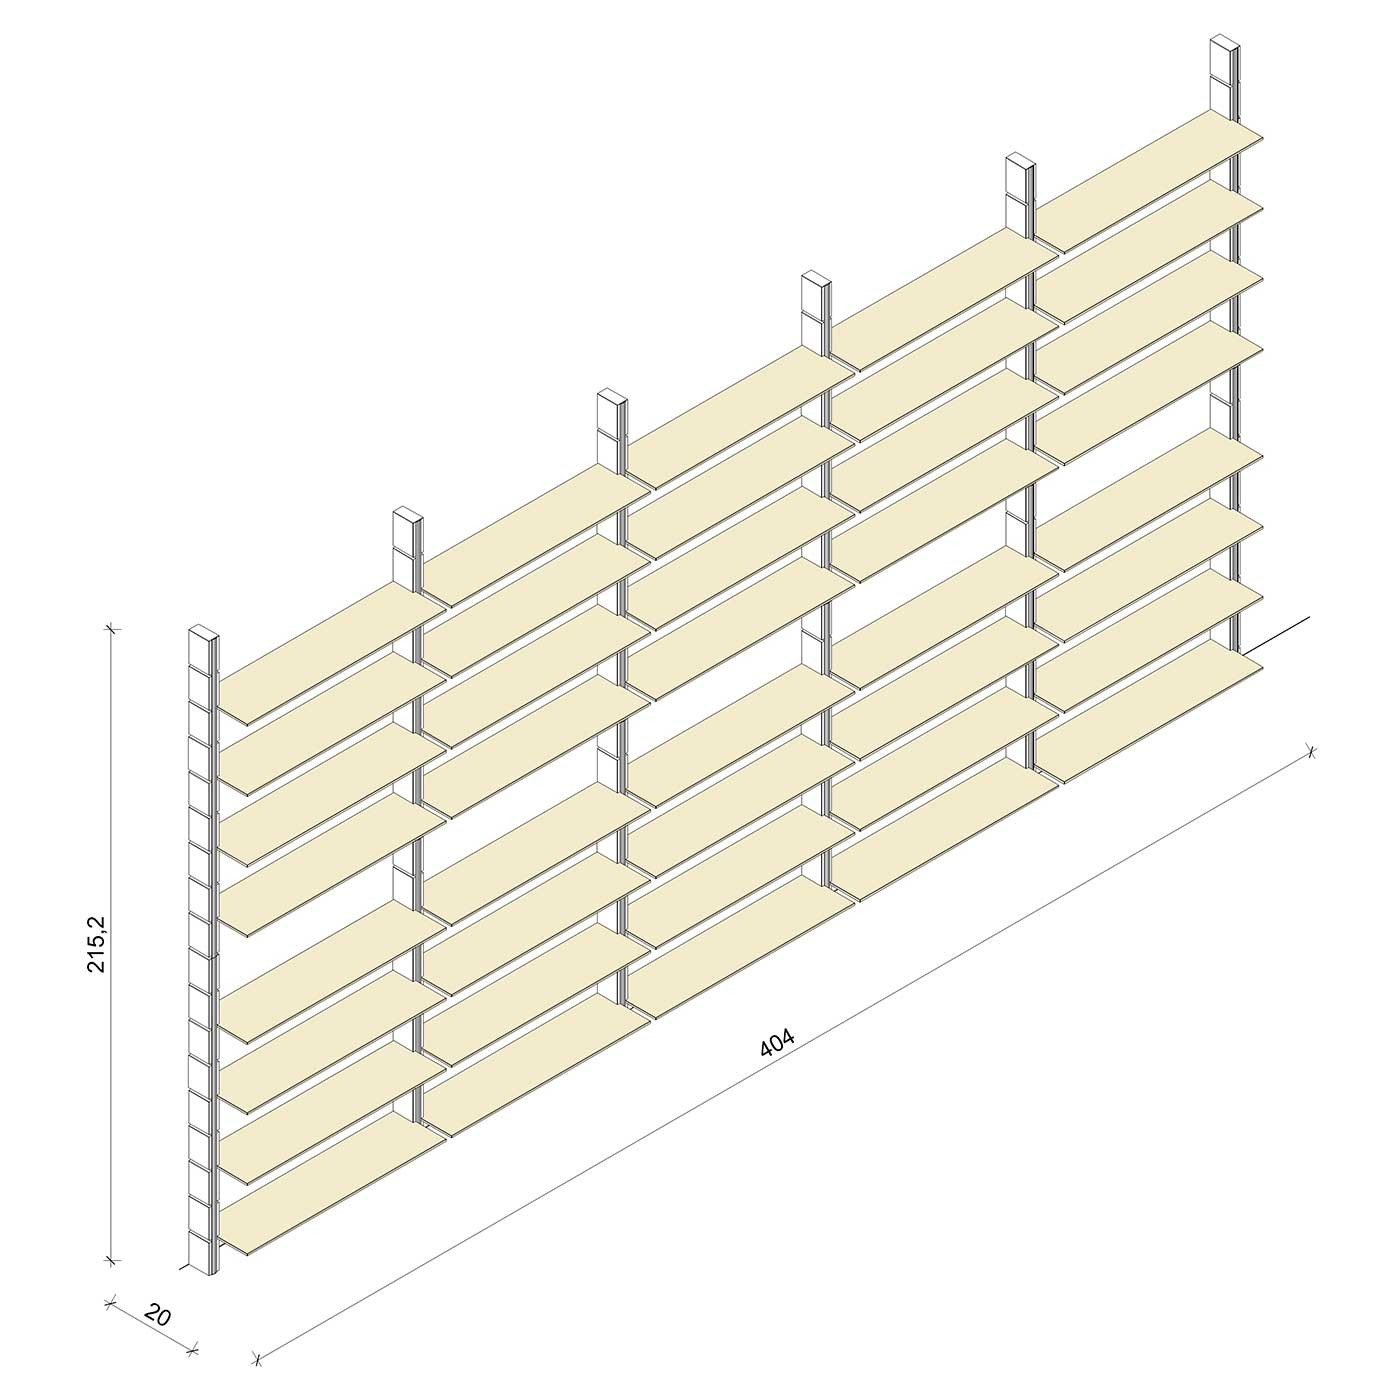 Bücherregal - Classic (XL) 404 - Maß: 404 x 215,2 x 20 cm (B x H x T)